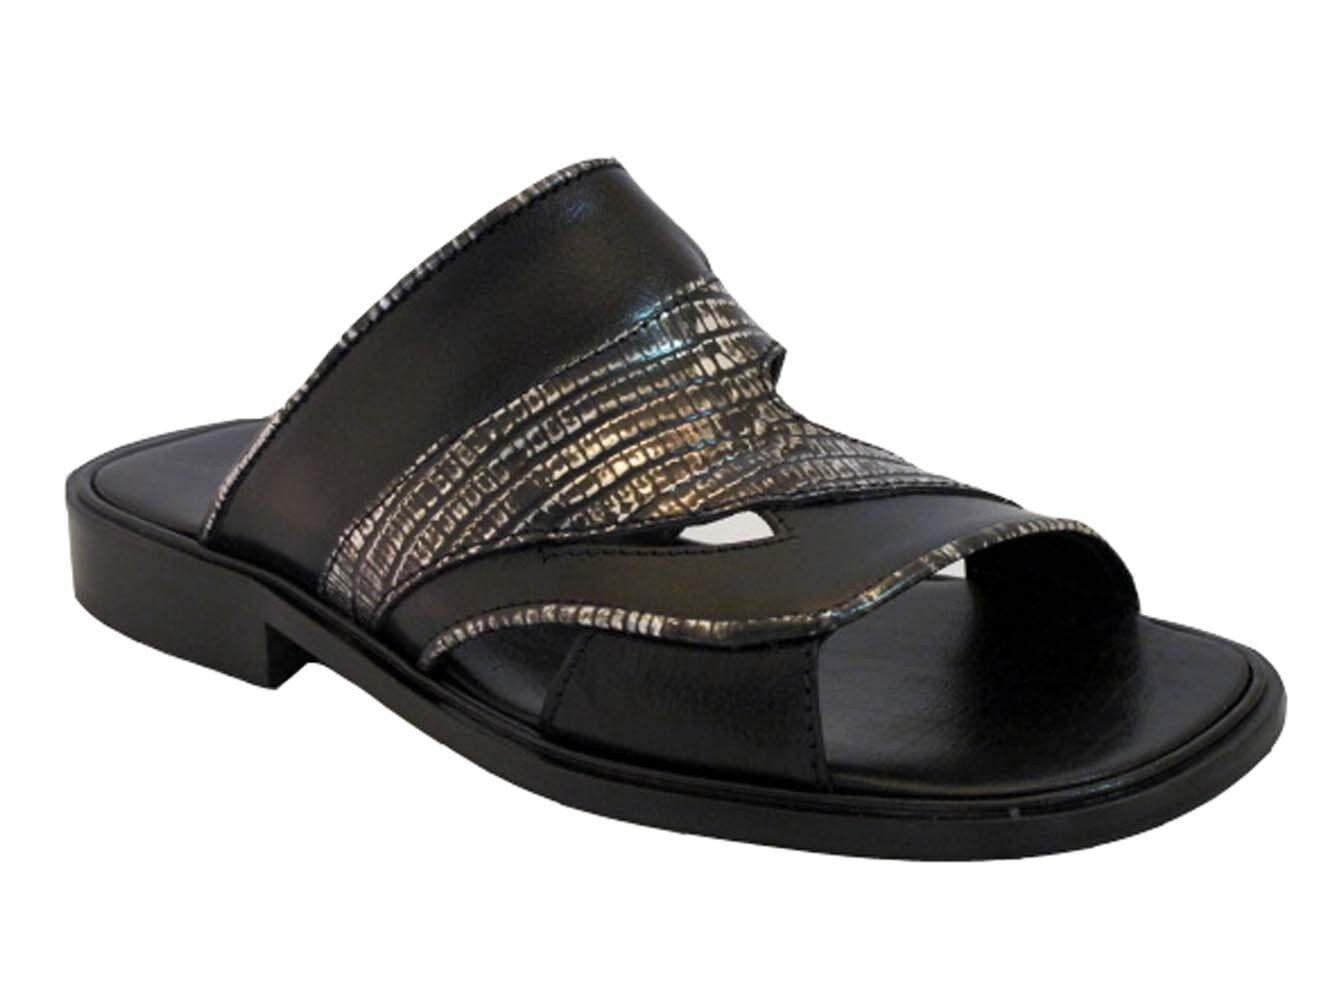 Davinci 3936 Men's Italian Slip On Leather Woven Sandals Black